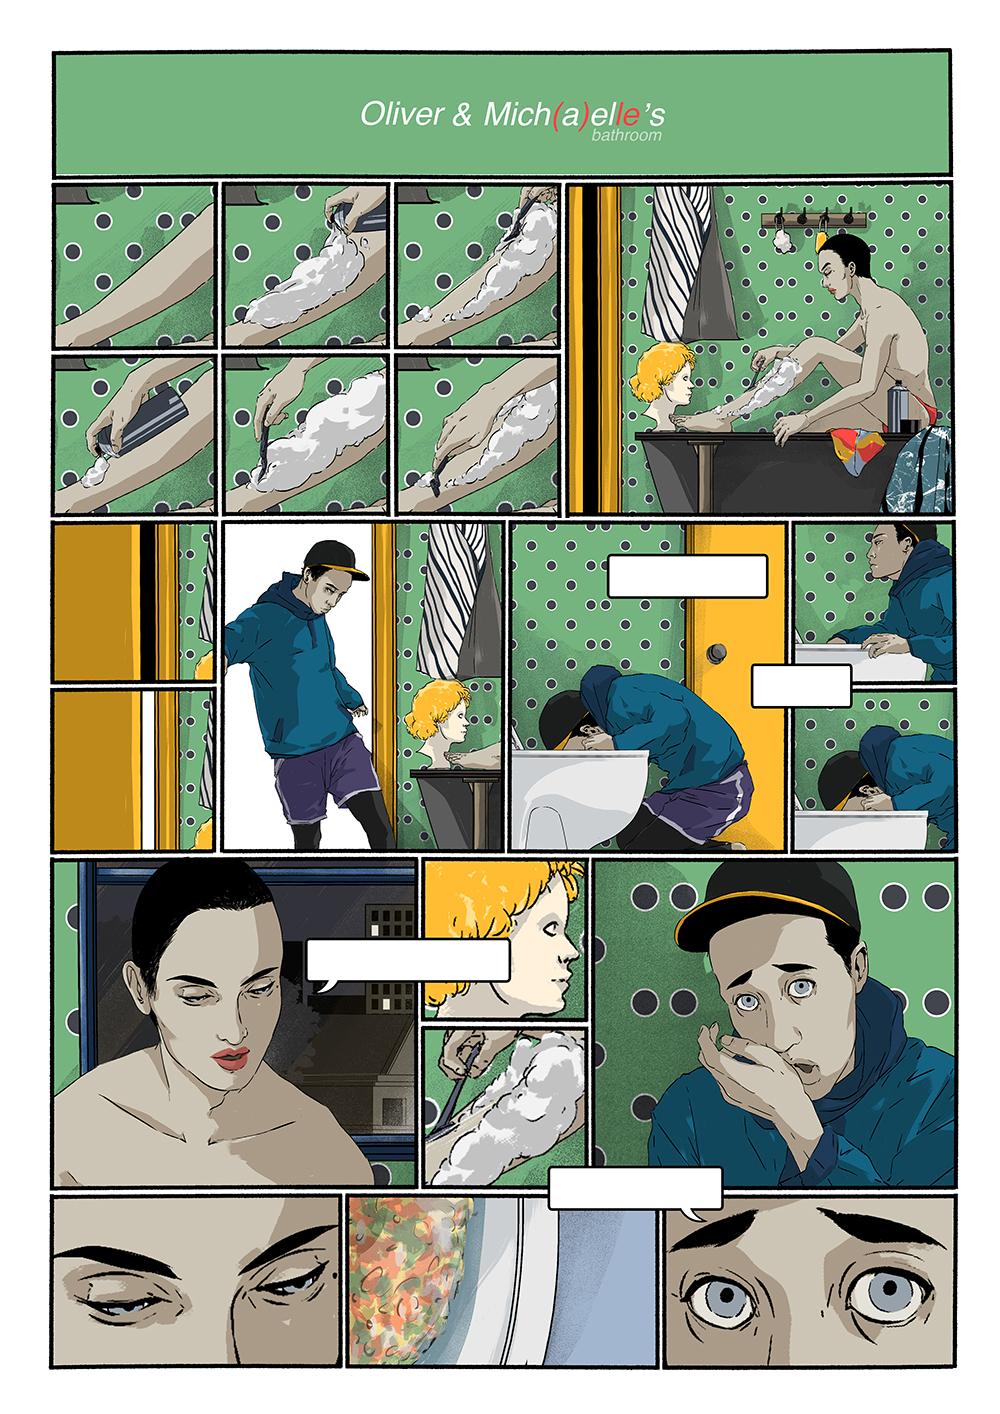 mojowang_illustration_1_4_1-2.jpg